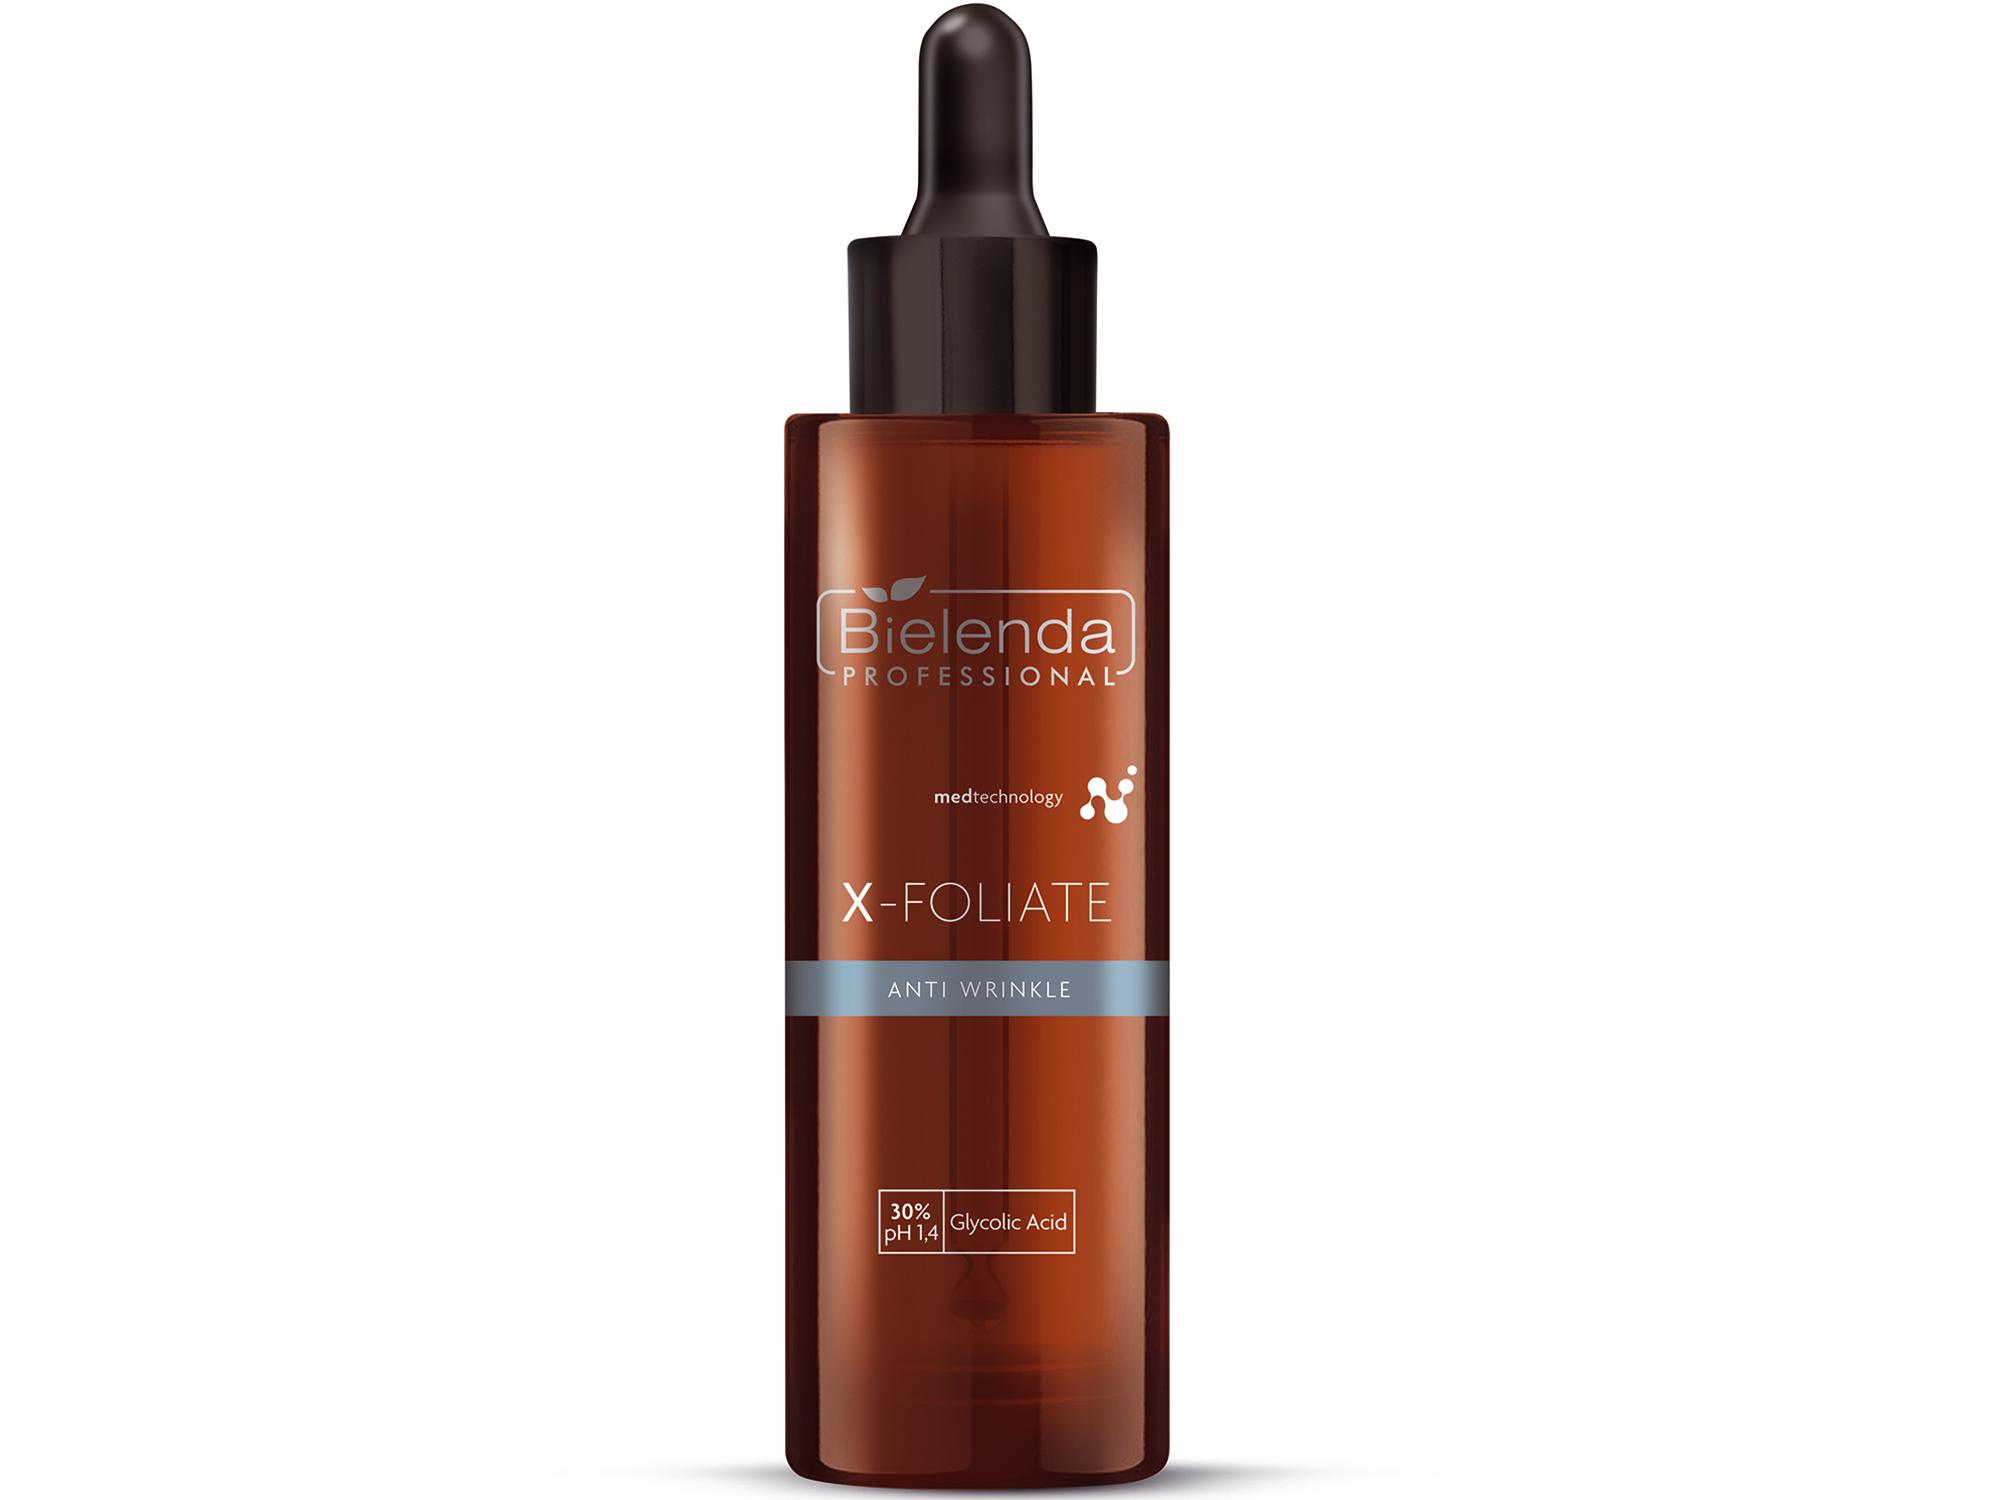 X-FOLIATE Anti Wrinkle Пилинг для кожи лица,  с мощным лифтинг эффектом, 30 мл.